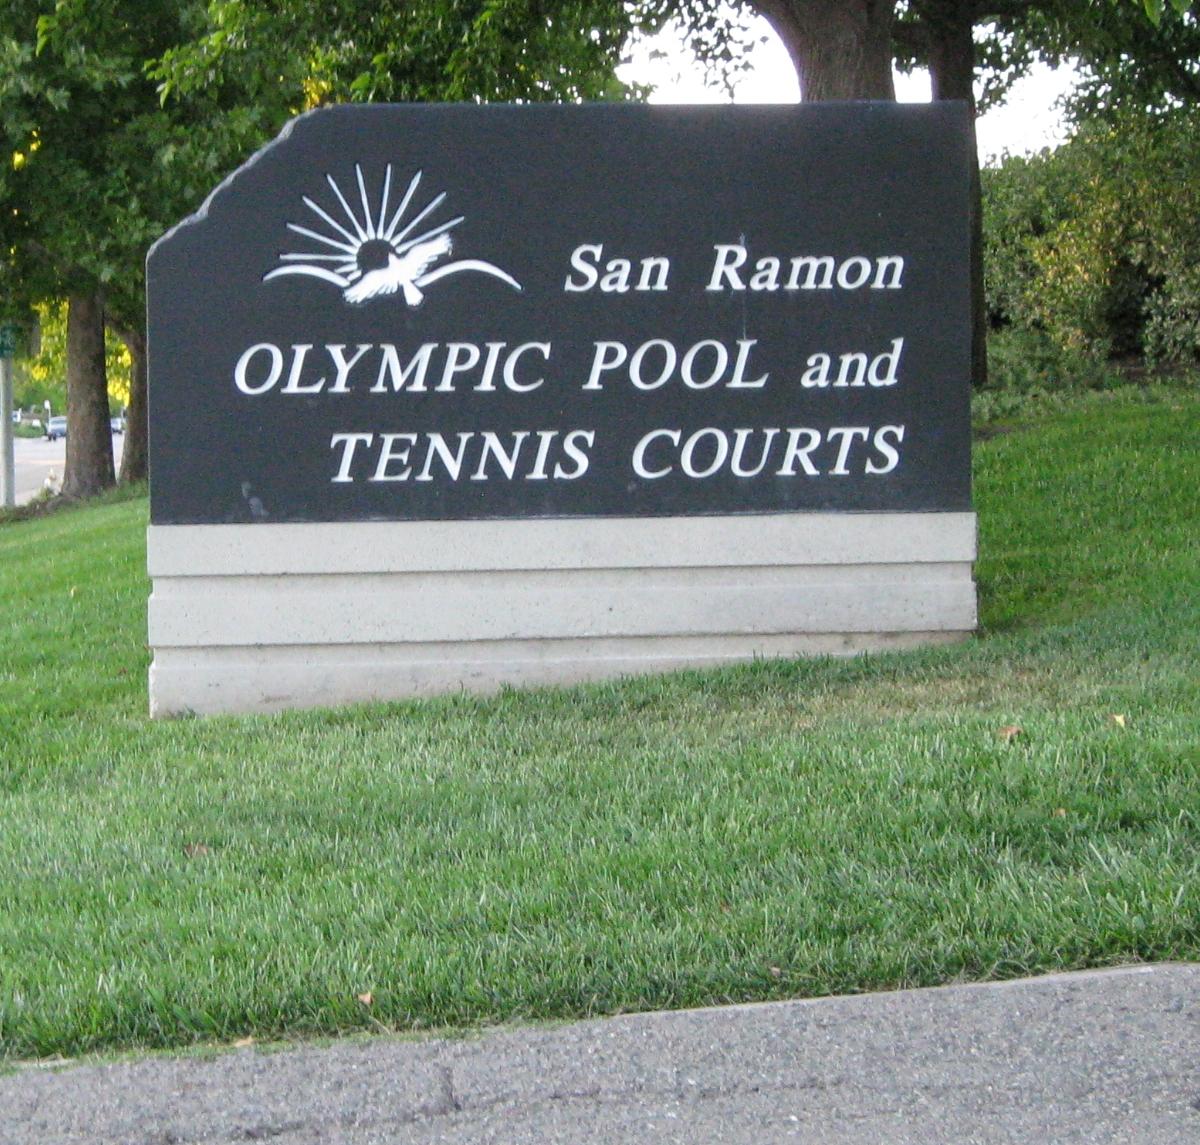 San Ramon Olympic Pool & Aquatic Center - San Ramon, CA Image